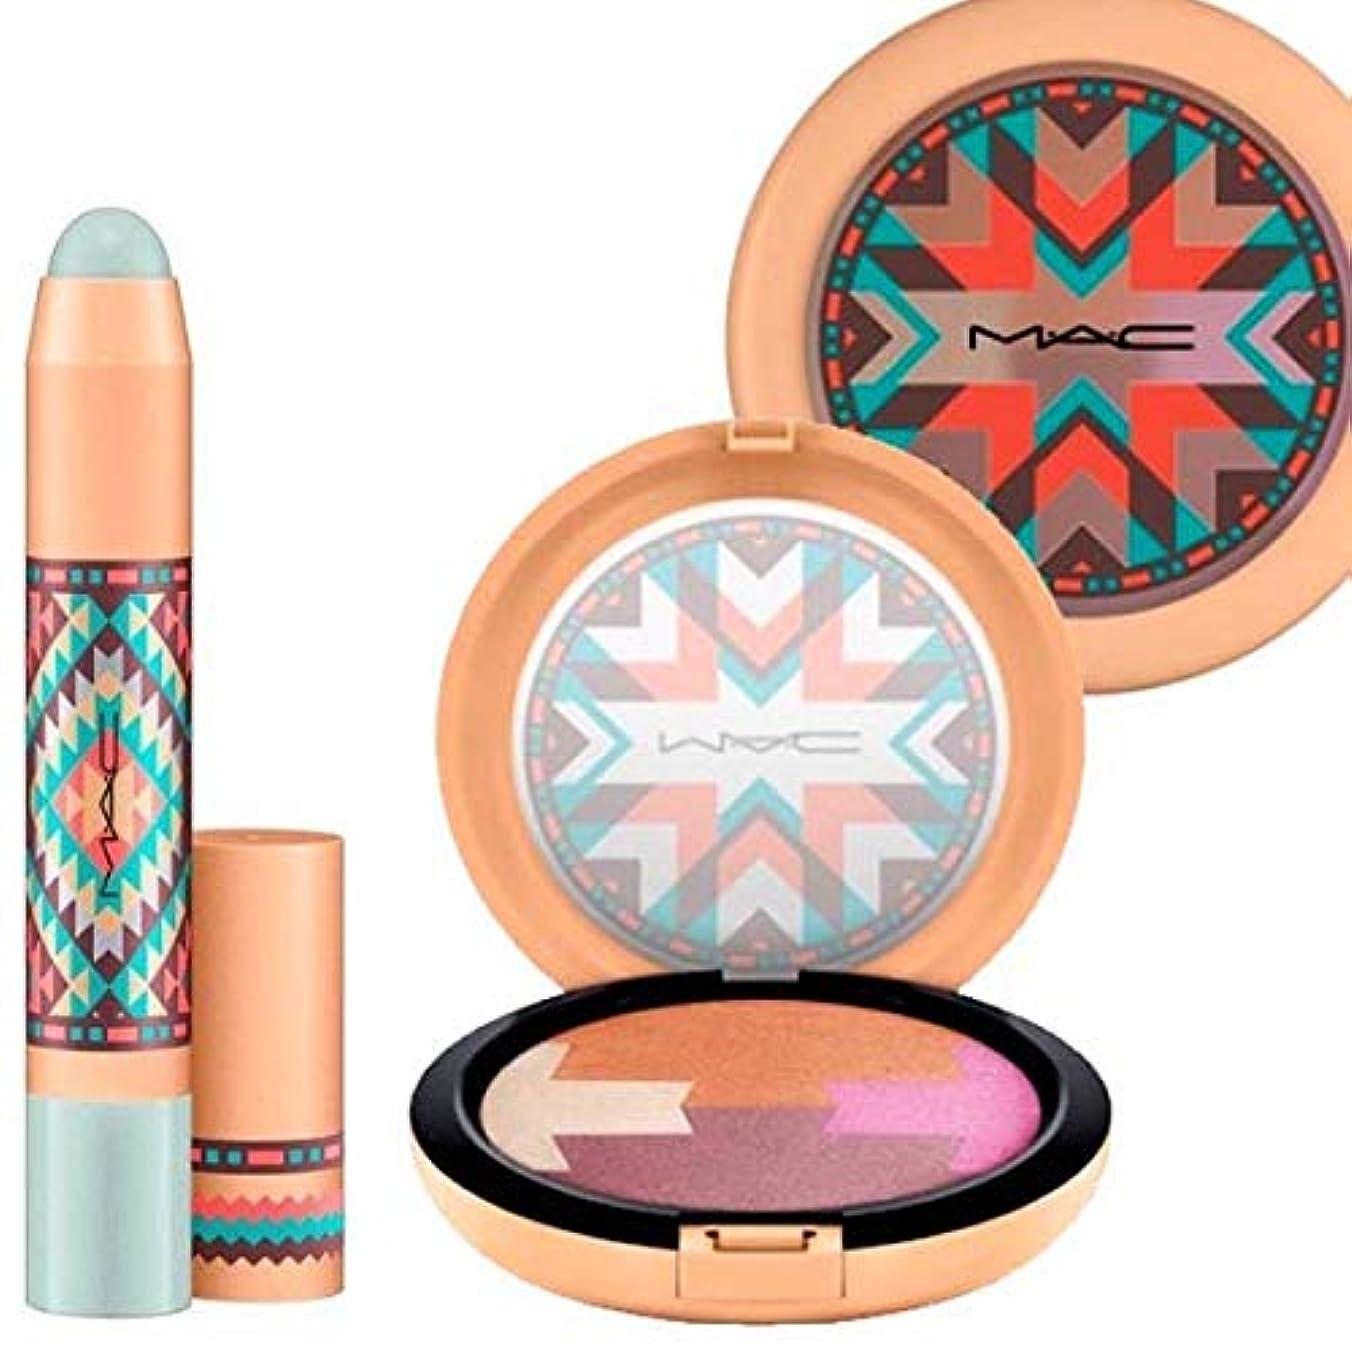 追放本能福祉M.A.C ?マック, 限定版 !!! Vibe Tribe/Gleamtones Powder & Desert Evening Lip Pencil [海外直送品] [並行輸入品]